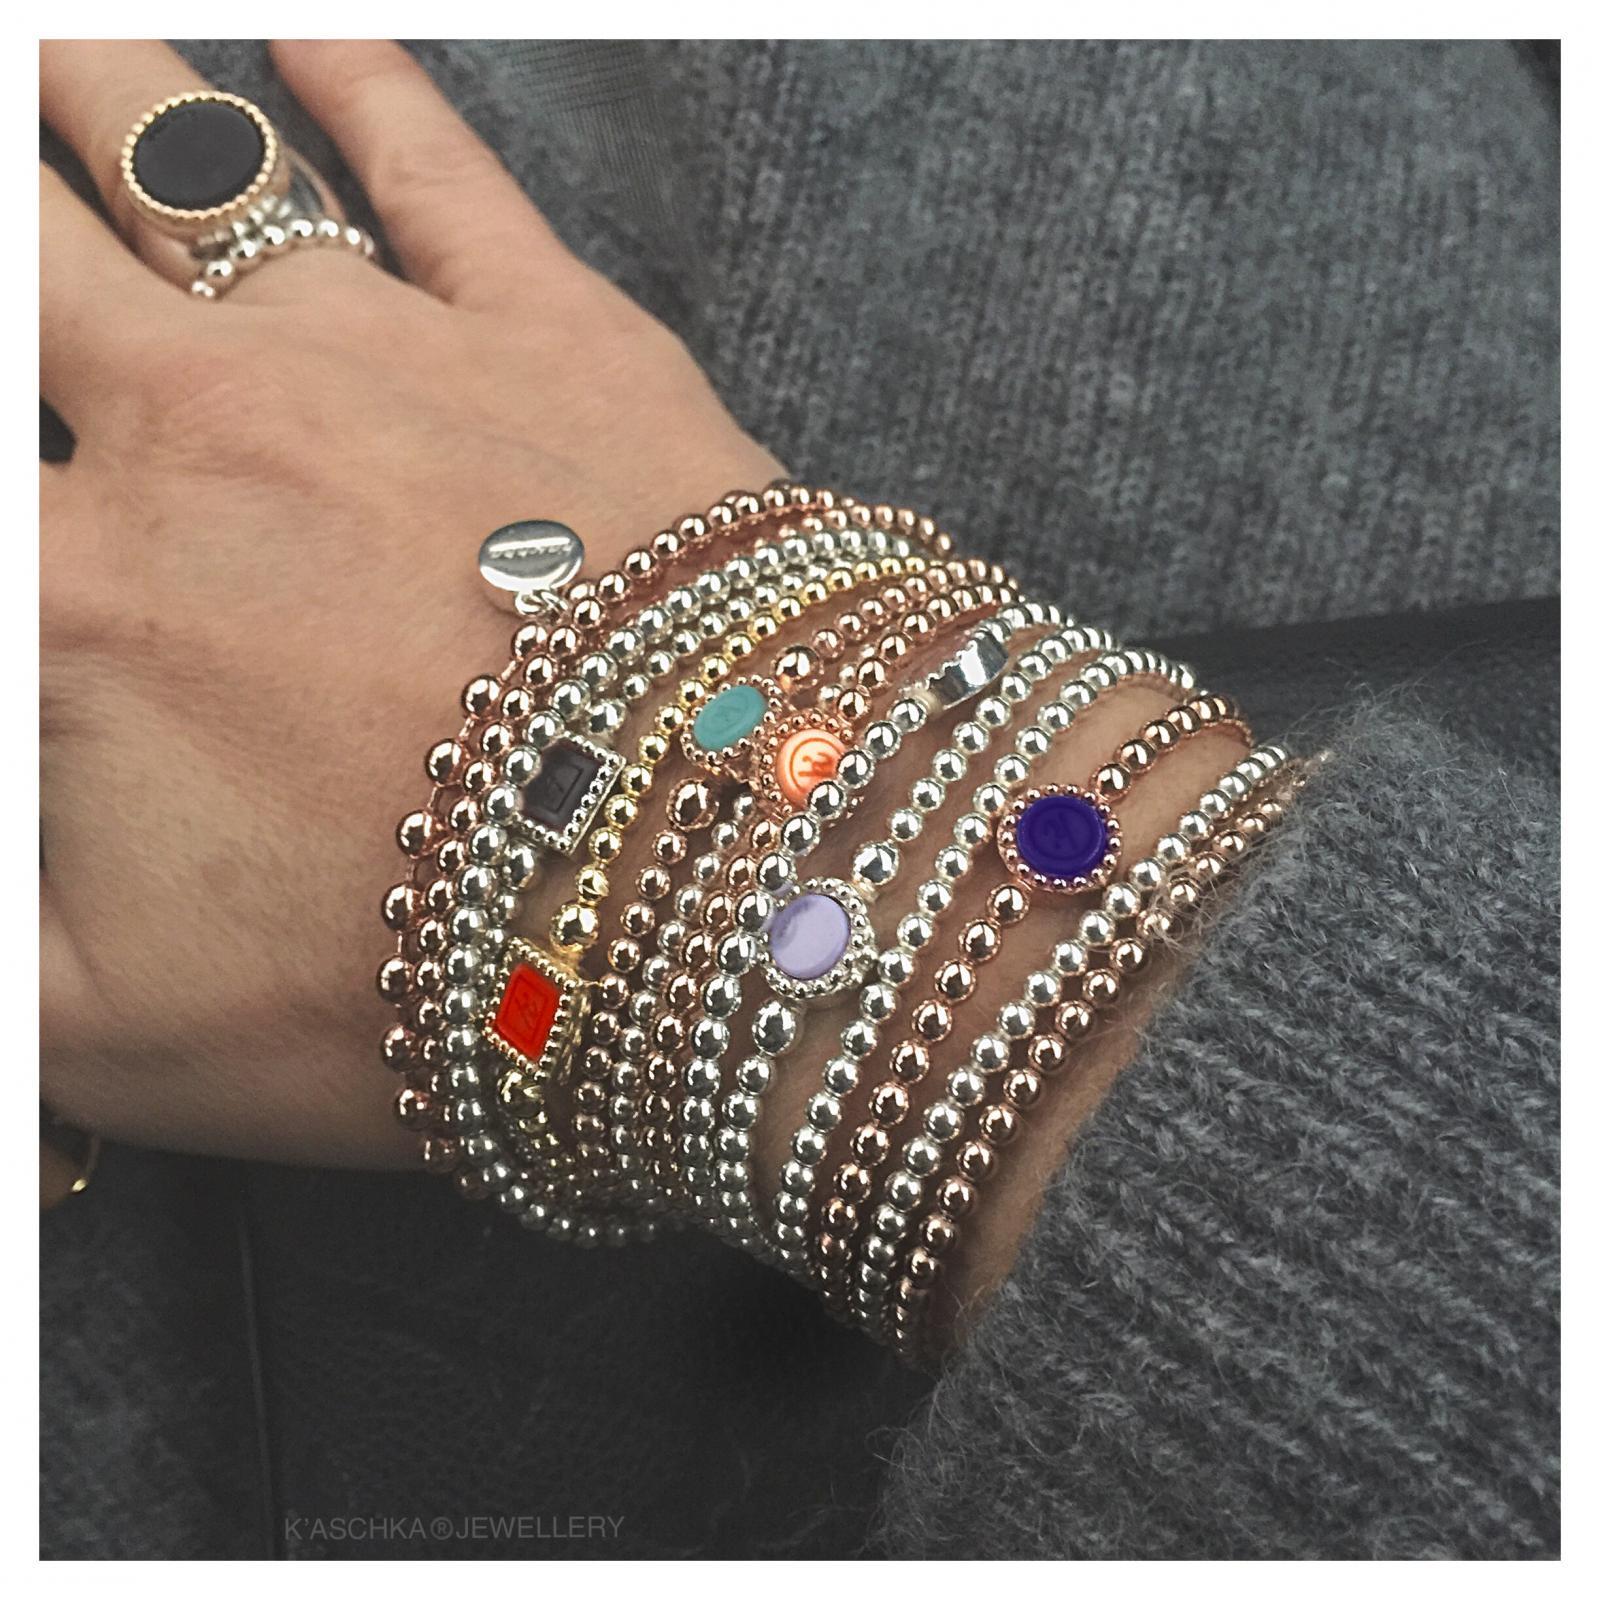 Ring met massief 18 karaat goud 925 Sterling zilveren ring Flexibele 925 sterling zilveren armband rond Flexibele 925 sterling zilveren armband vierkant